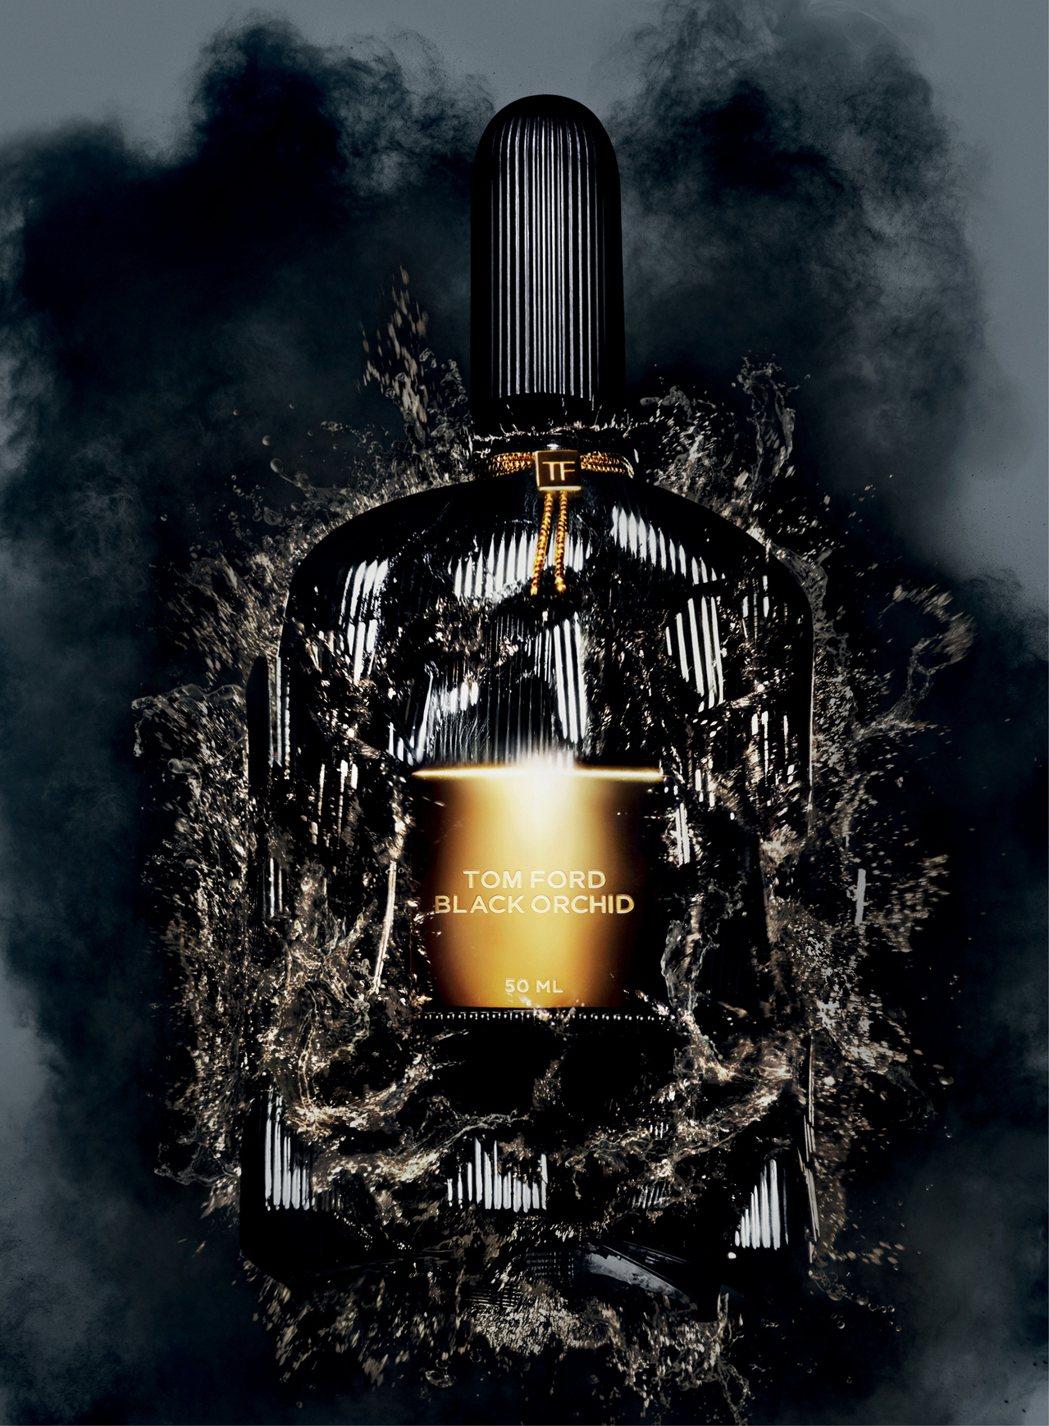 BLACK ORCHID經典黑蘭花香水是TOM FORD的第一款經典香氛。圖/T...